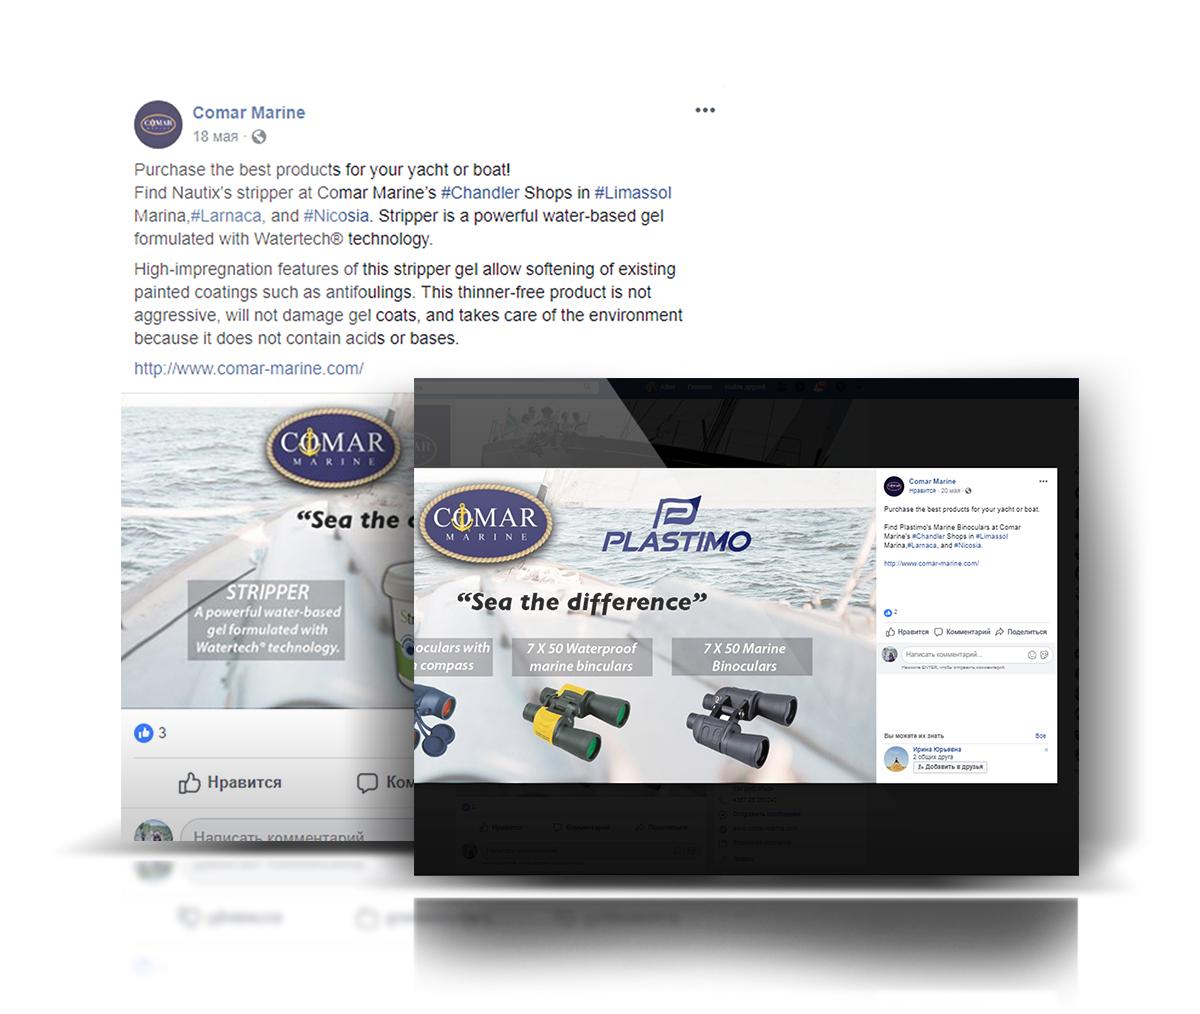 Branding Box: Social Media Comar Marine